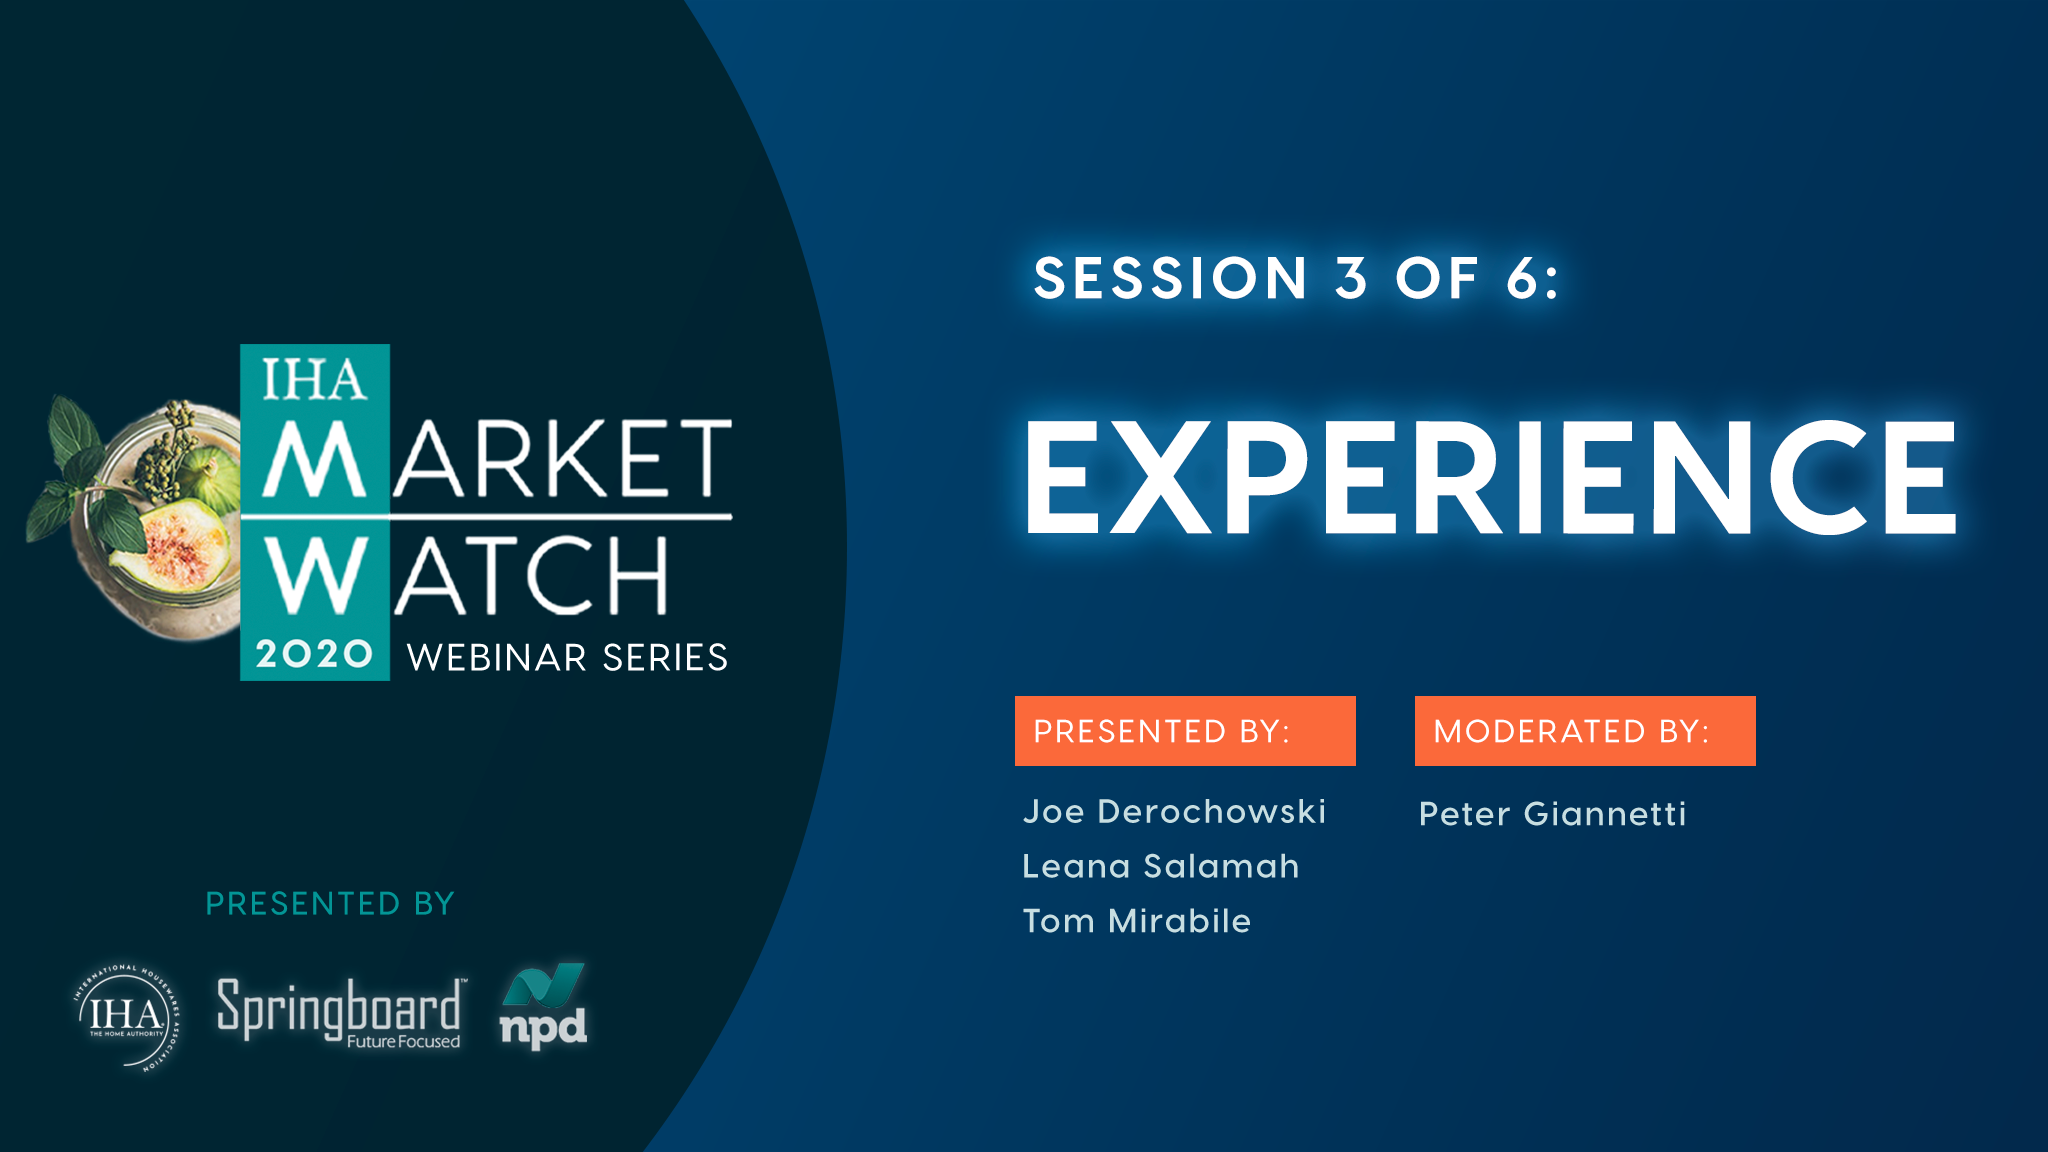 IHA Market Watch - Session 3 - Experience